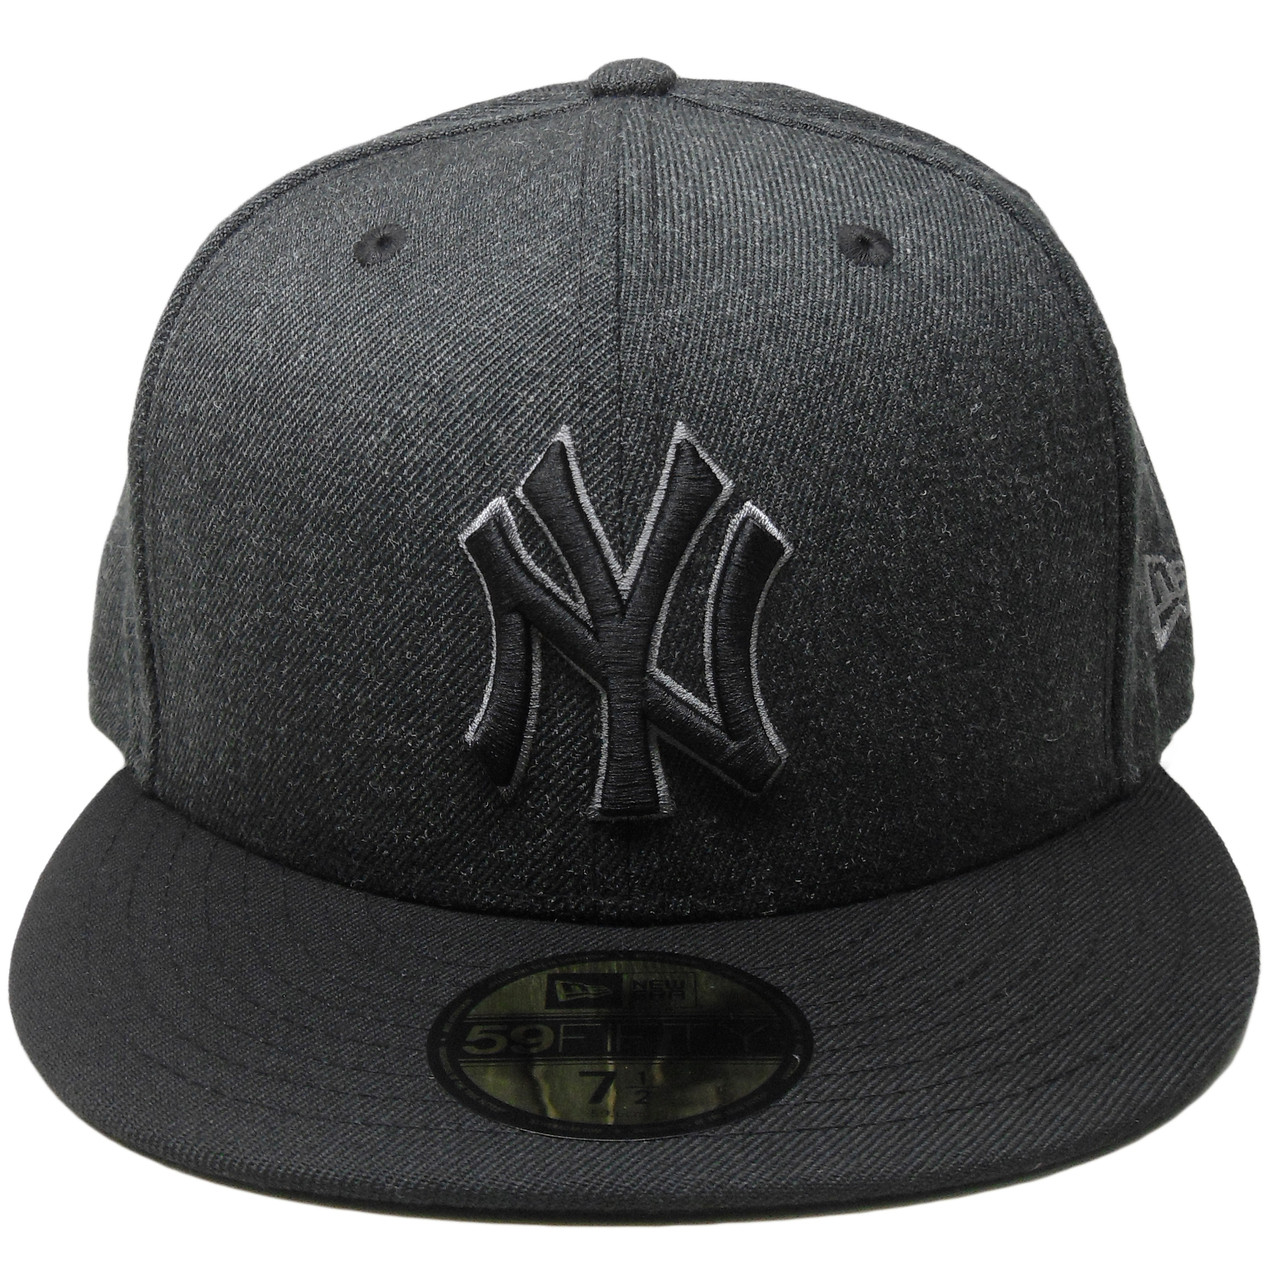 12bdad9aaf97f New York Yankees New Era Custom 59Fifty Fitted - Black Denim